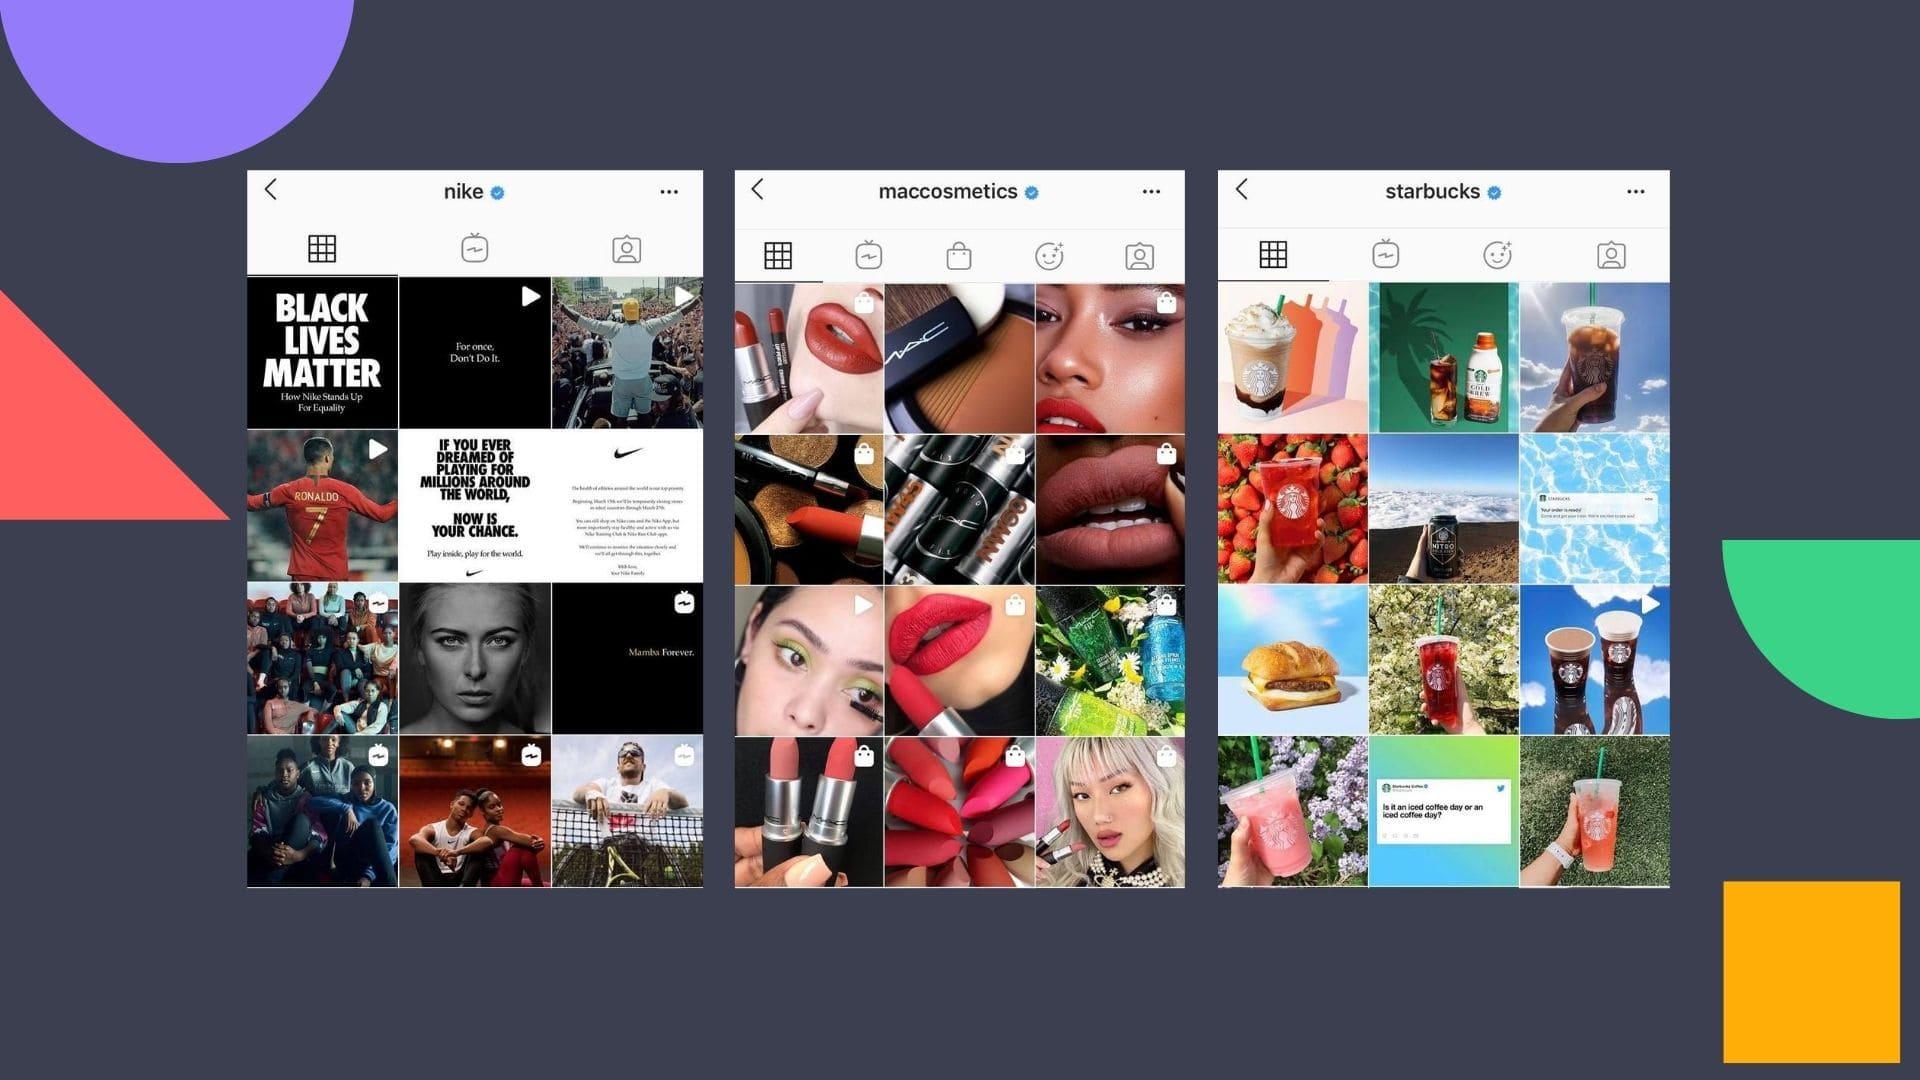 Nike, Maccosmetics, Starbucks Instagram accounts